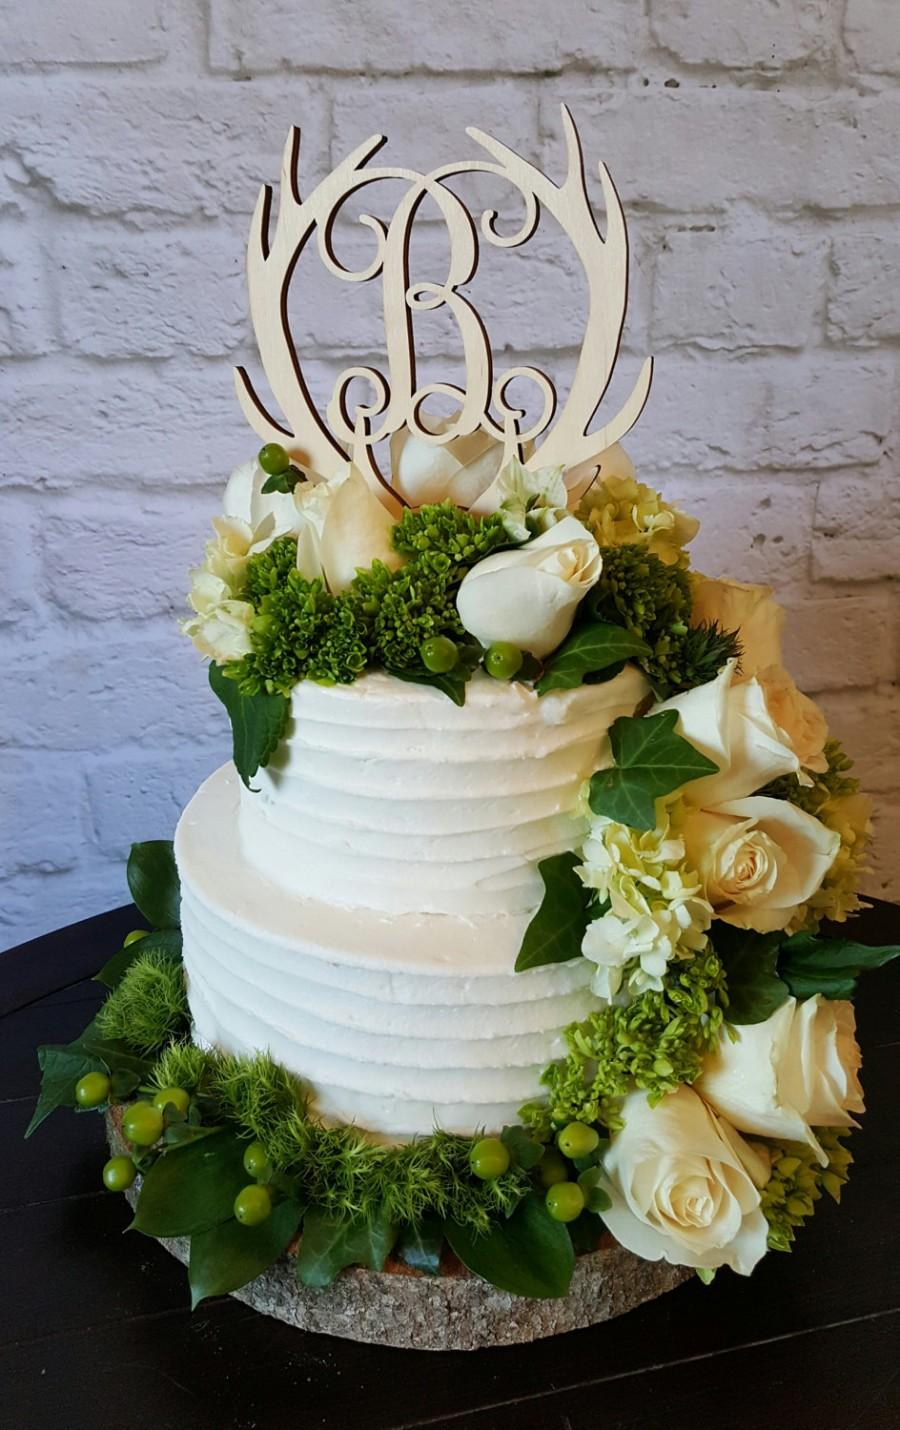 Wedding - Antler Cake Topper - UNPAINTED Wooden Monogram Cake Topper - Wedding Cake Topper - Birthday Cake Topper